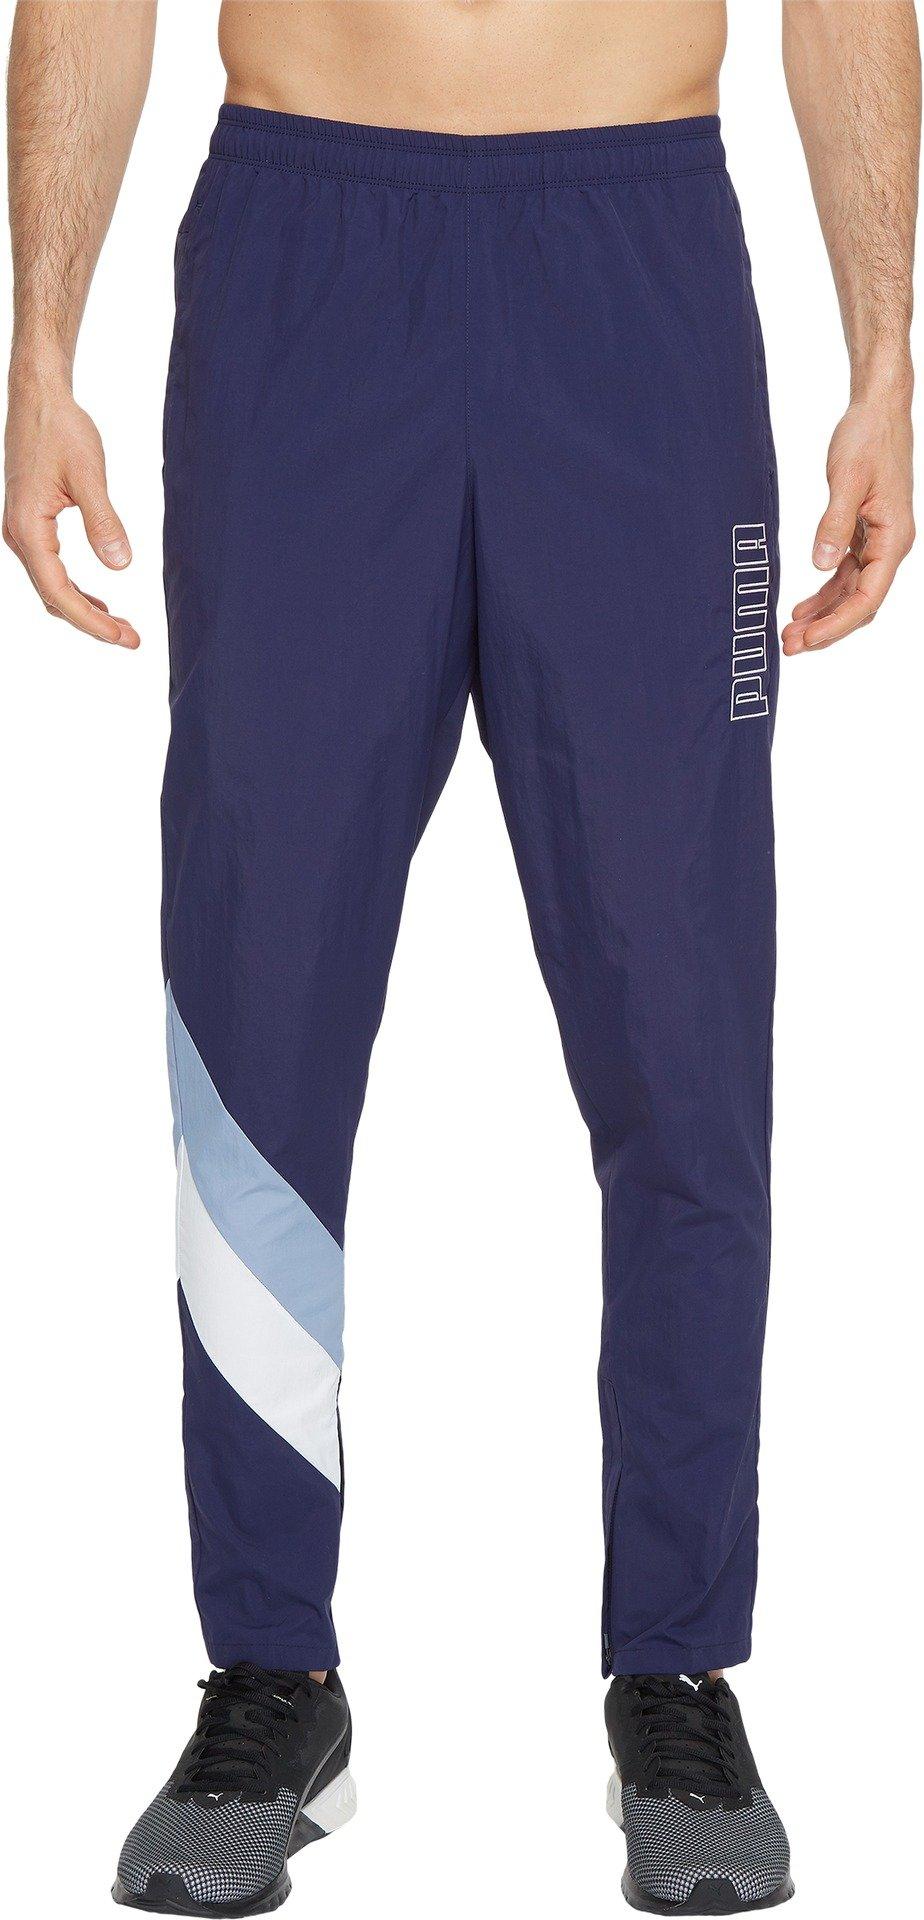 PUMA Men's Heritage Pants, Peacoat/Infinity, L